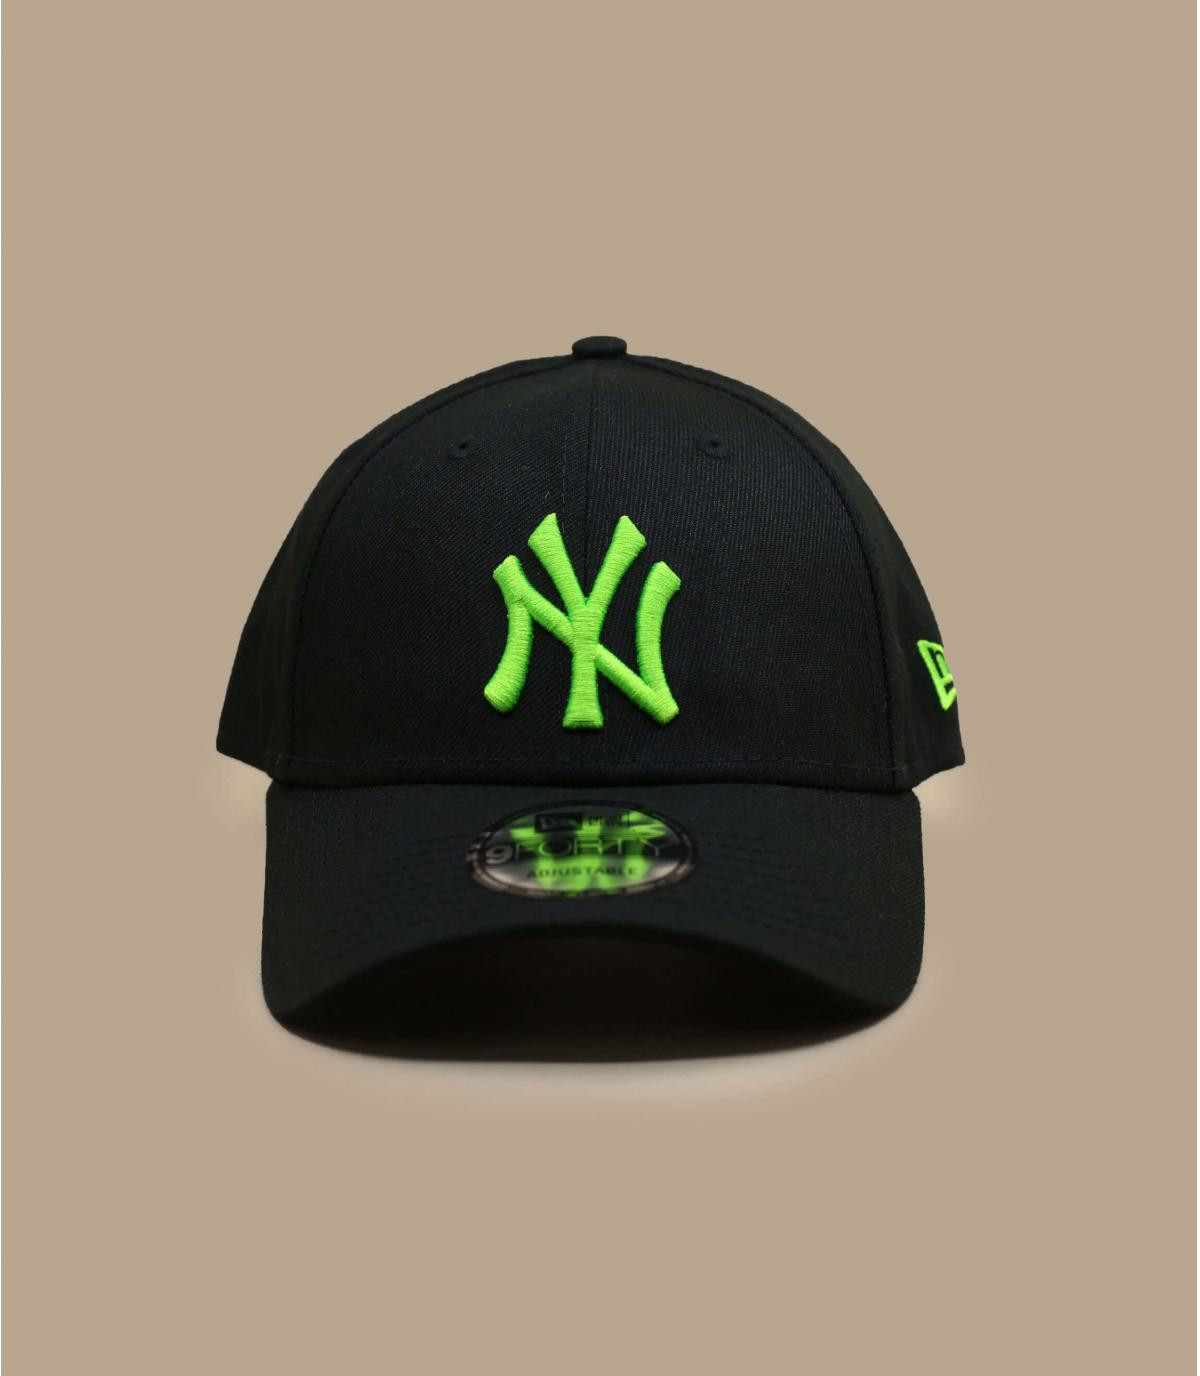 Détails Casquette Neon Pack NY 940 black green - image 2